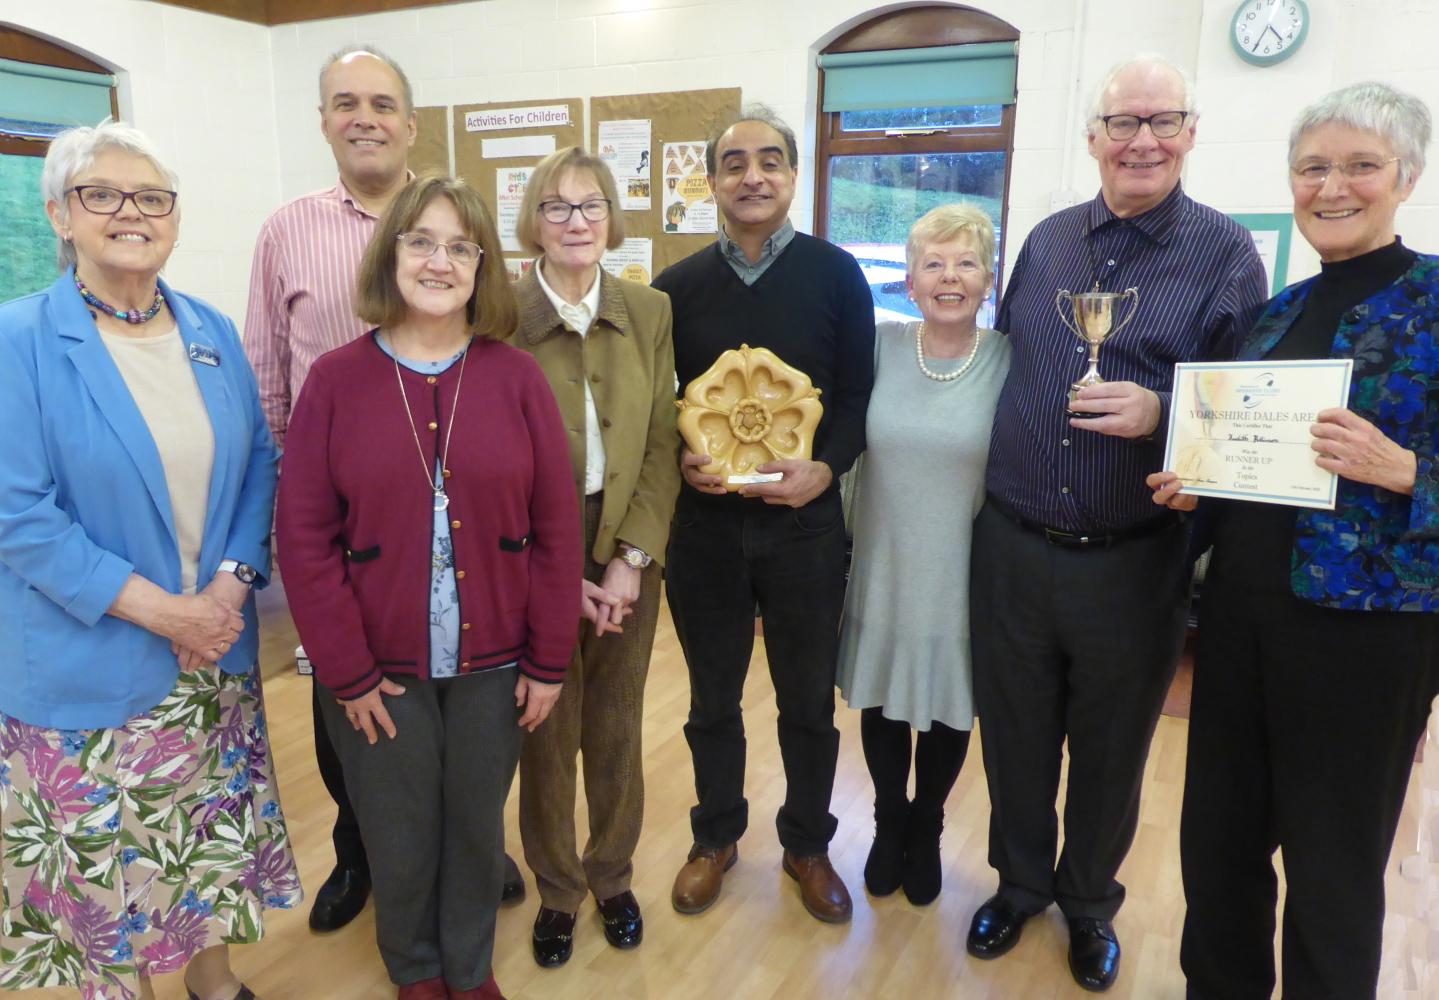 Bradford Speakers Club claims prizes